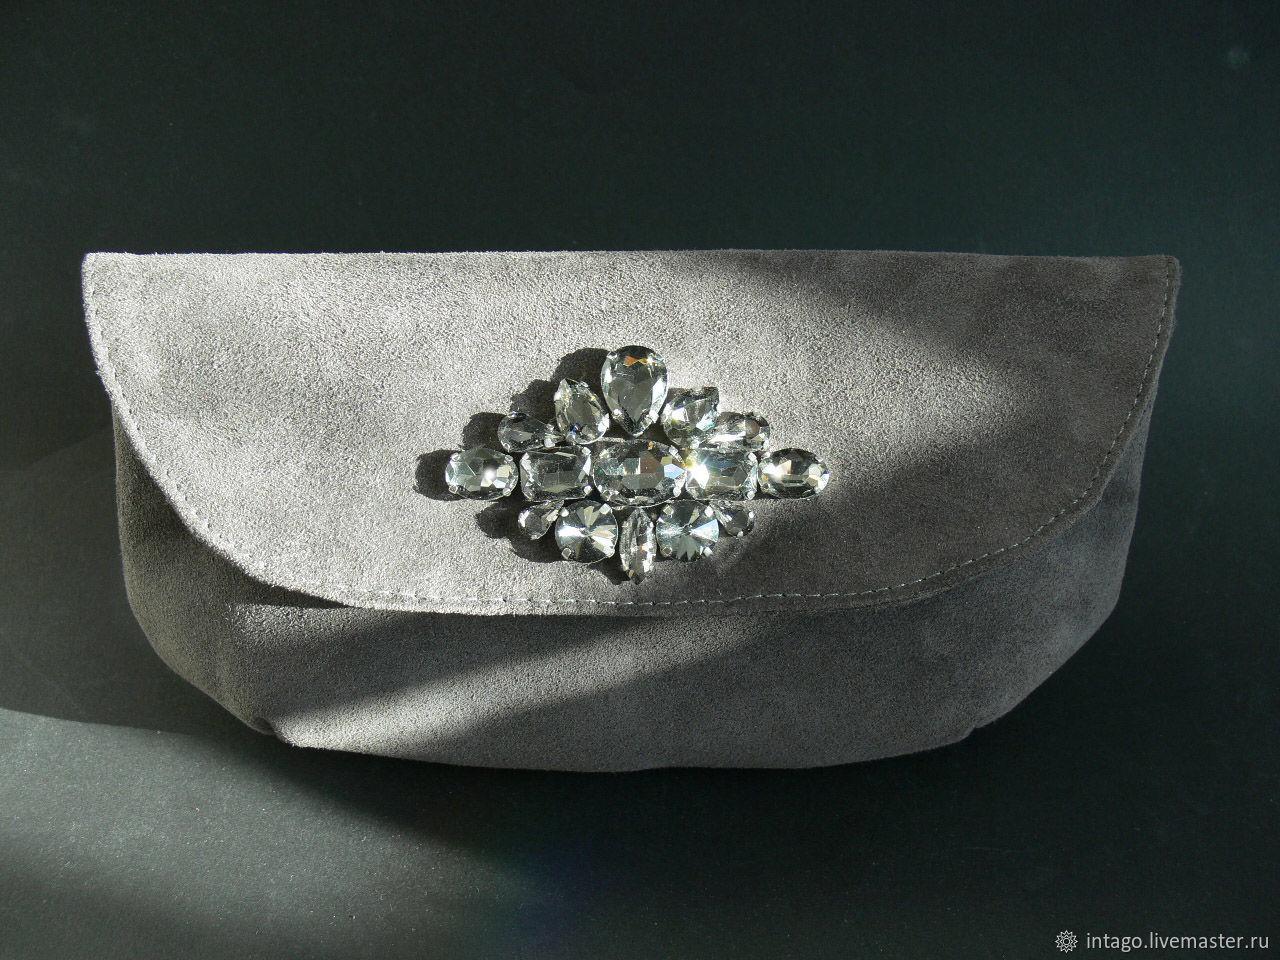 Dark grey suede clutch with rhinestones, Clutches, Novosibirsk,  Фото №1